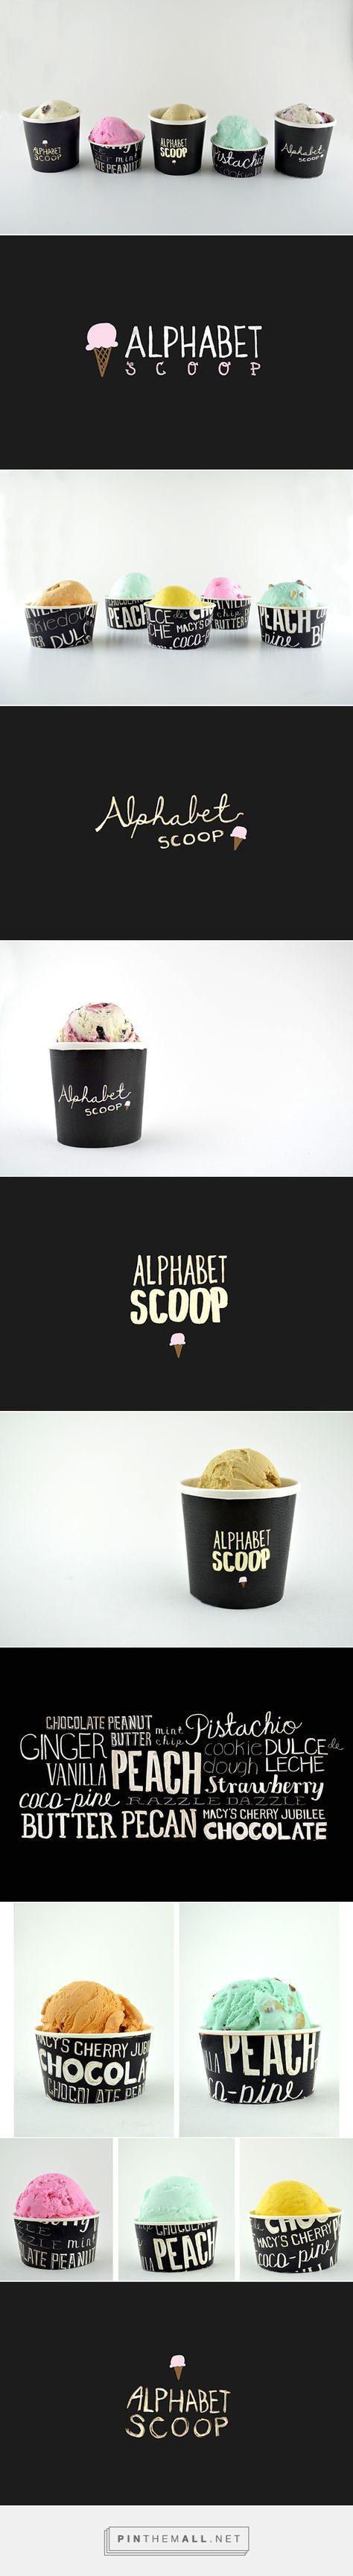 Alphabet Scoop Ice Cream Packaging Rebrand by Rebecca Lim | Fivestar Branding – Design and Branding Agency & Inspiration Gallery